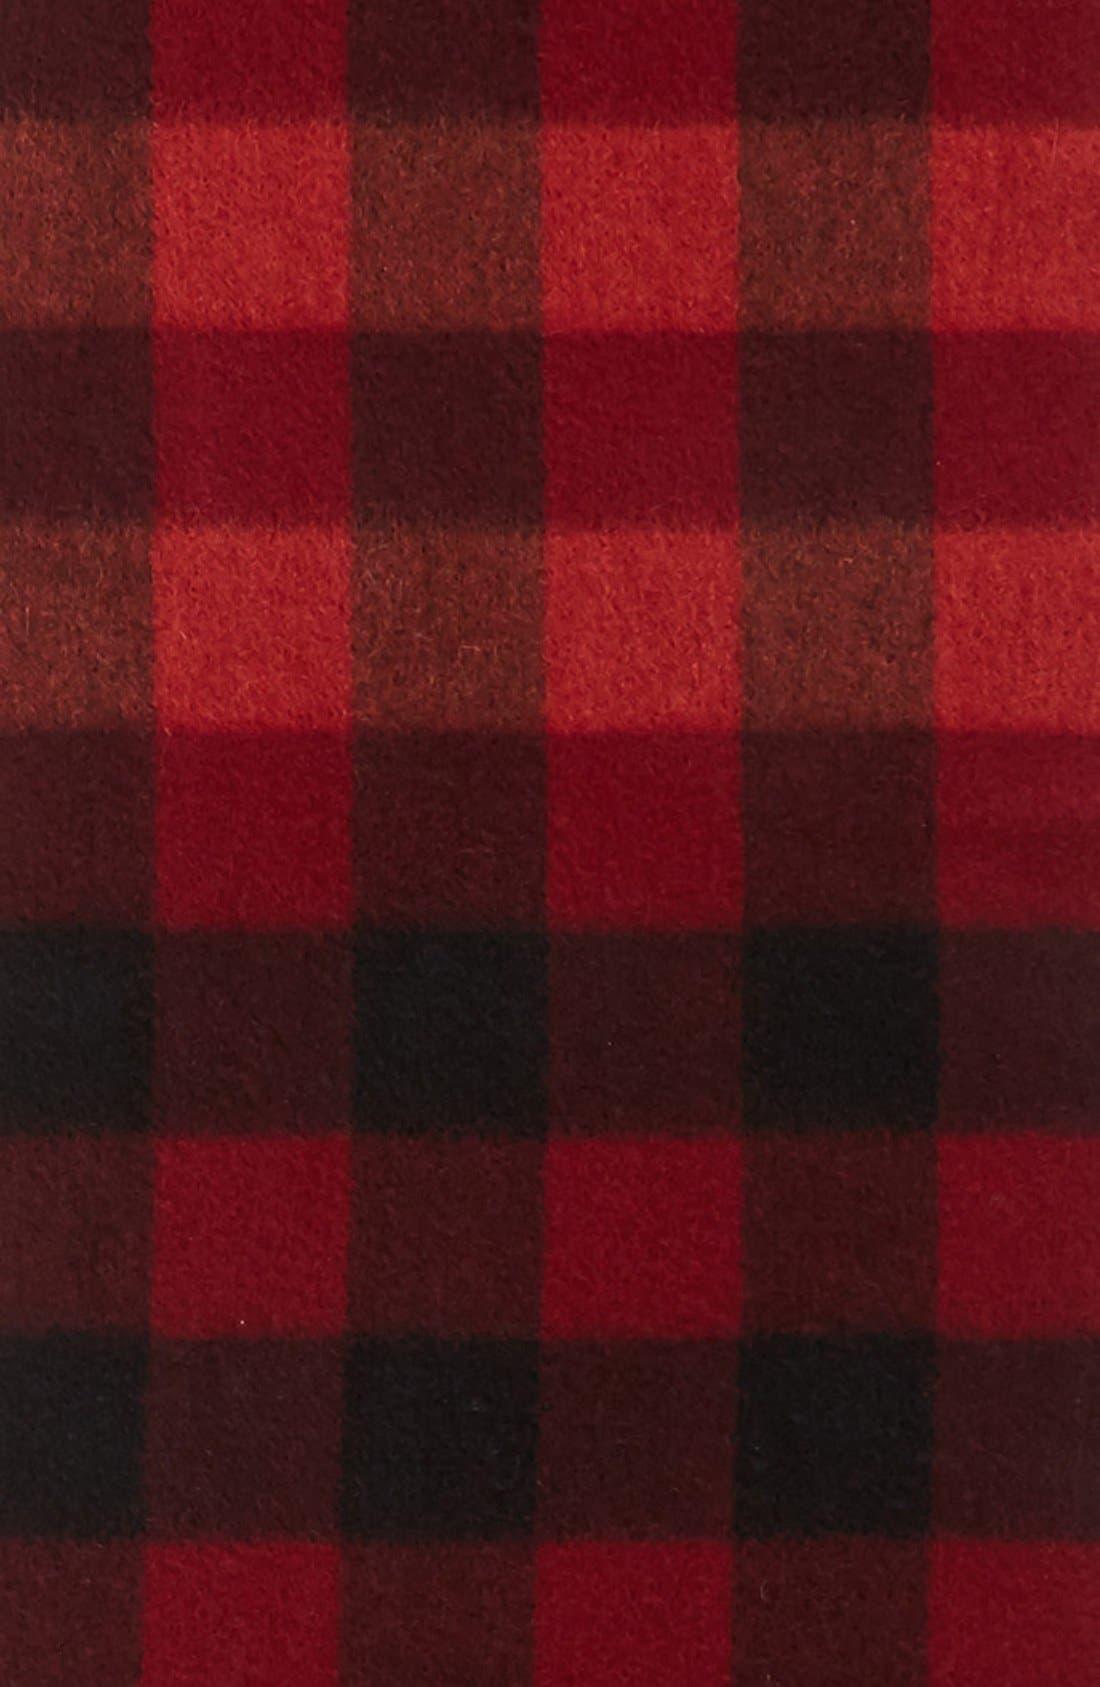 Alternate Image 2  - Nordstrom 'Blocked Checks' Cashmere Scarf